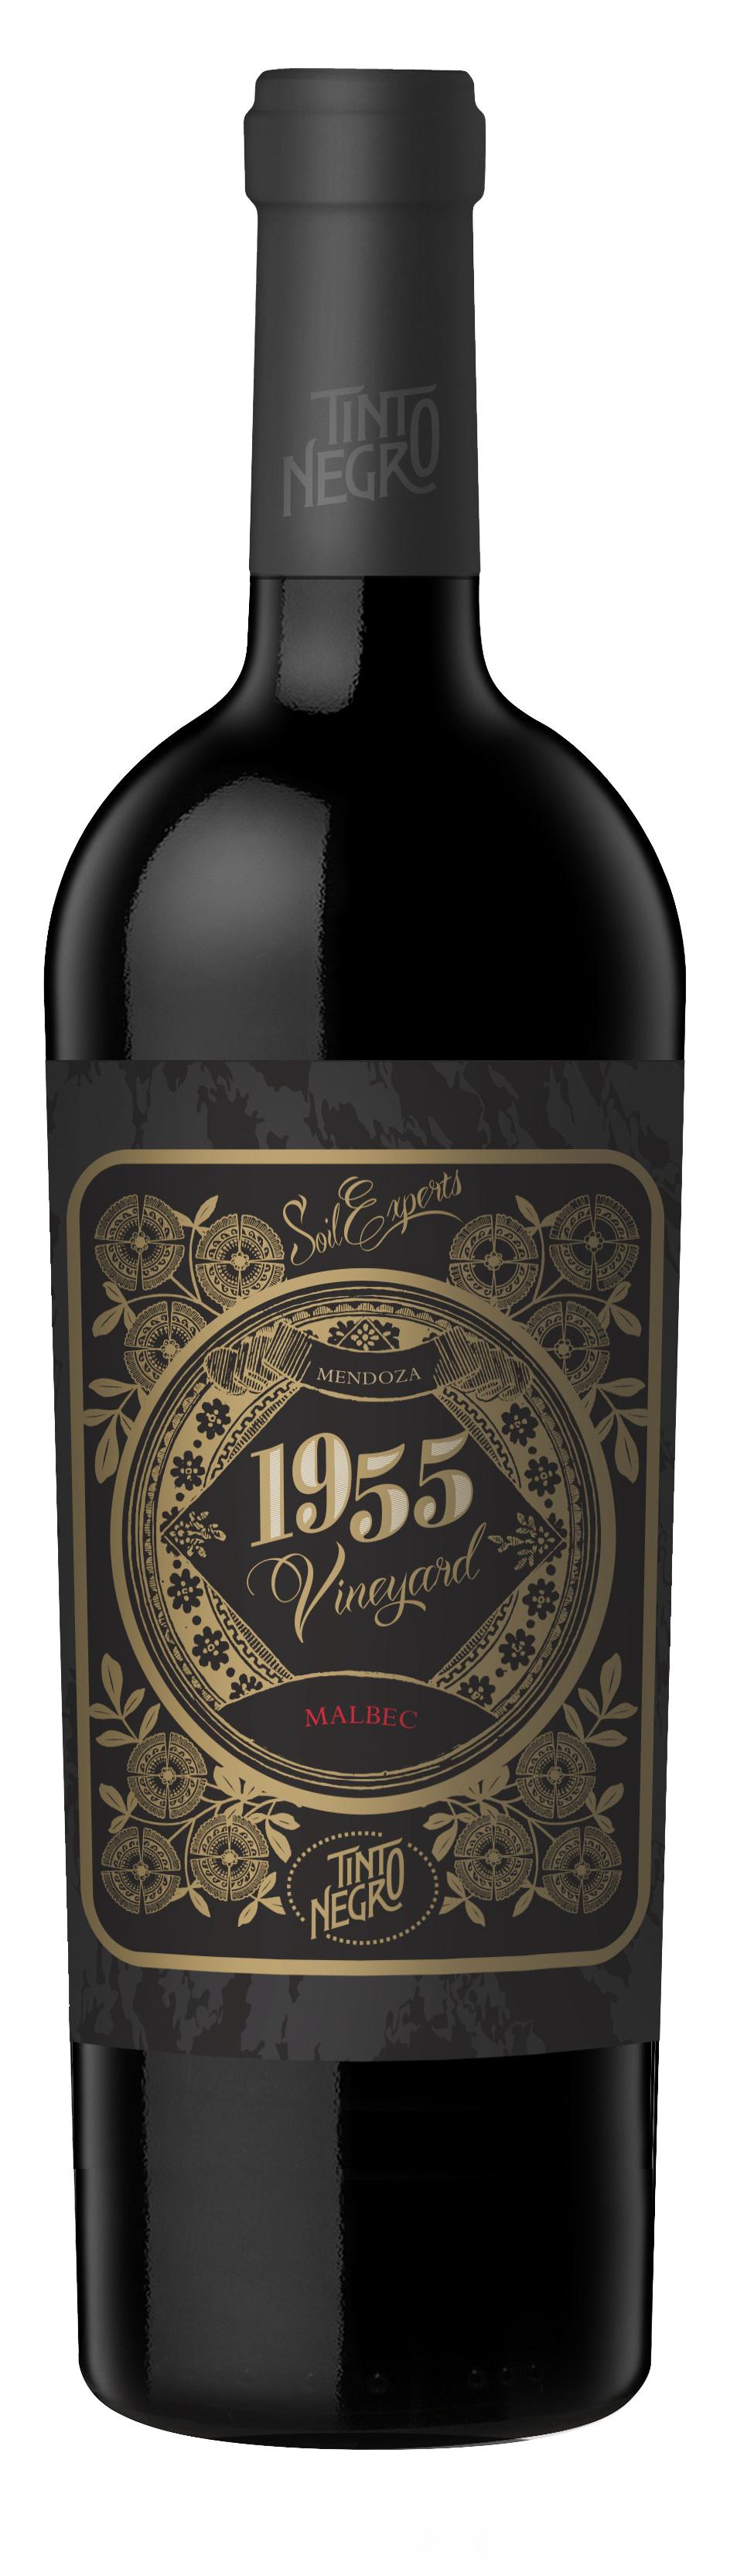 TintoNegro 1955 Vineyard Bottle.jpg